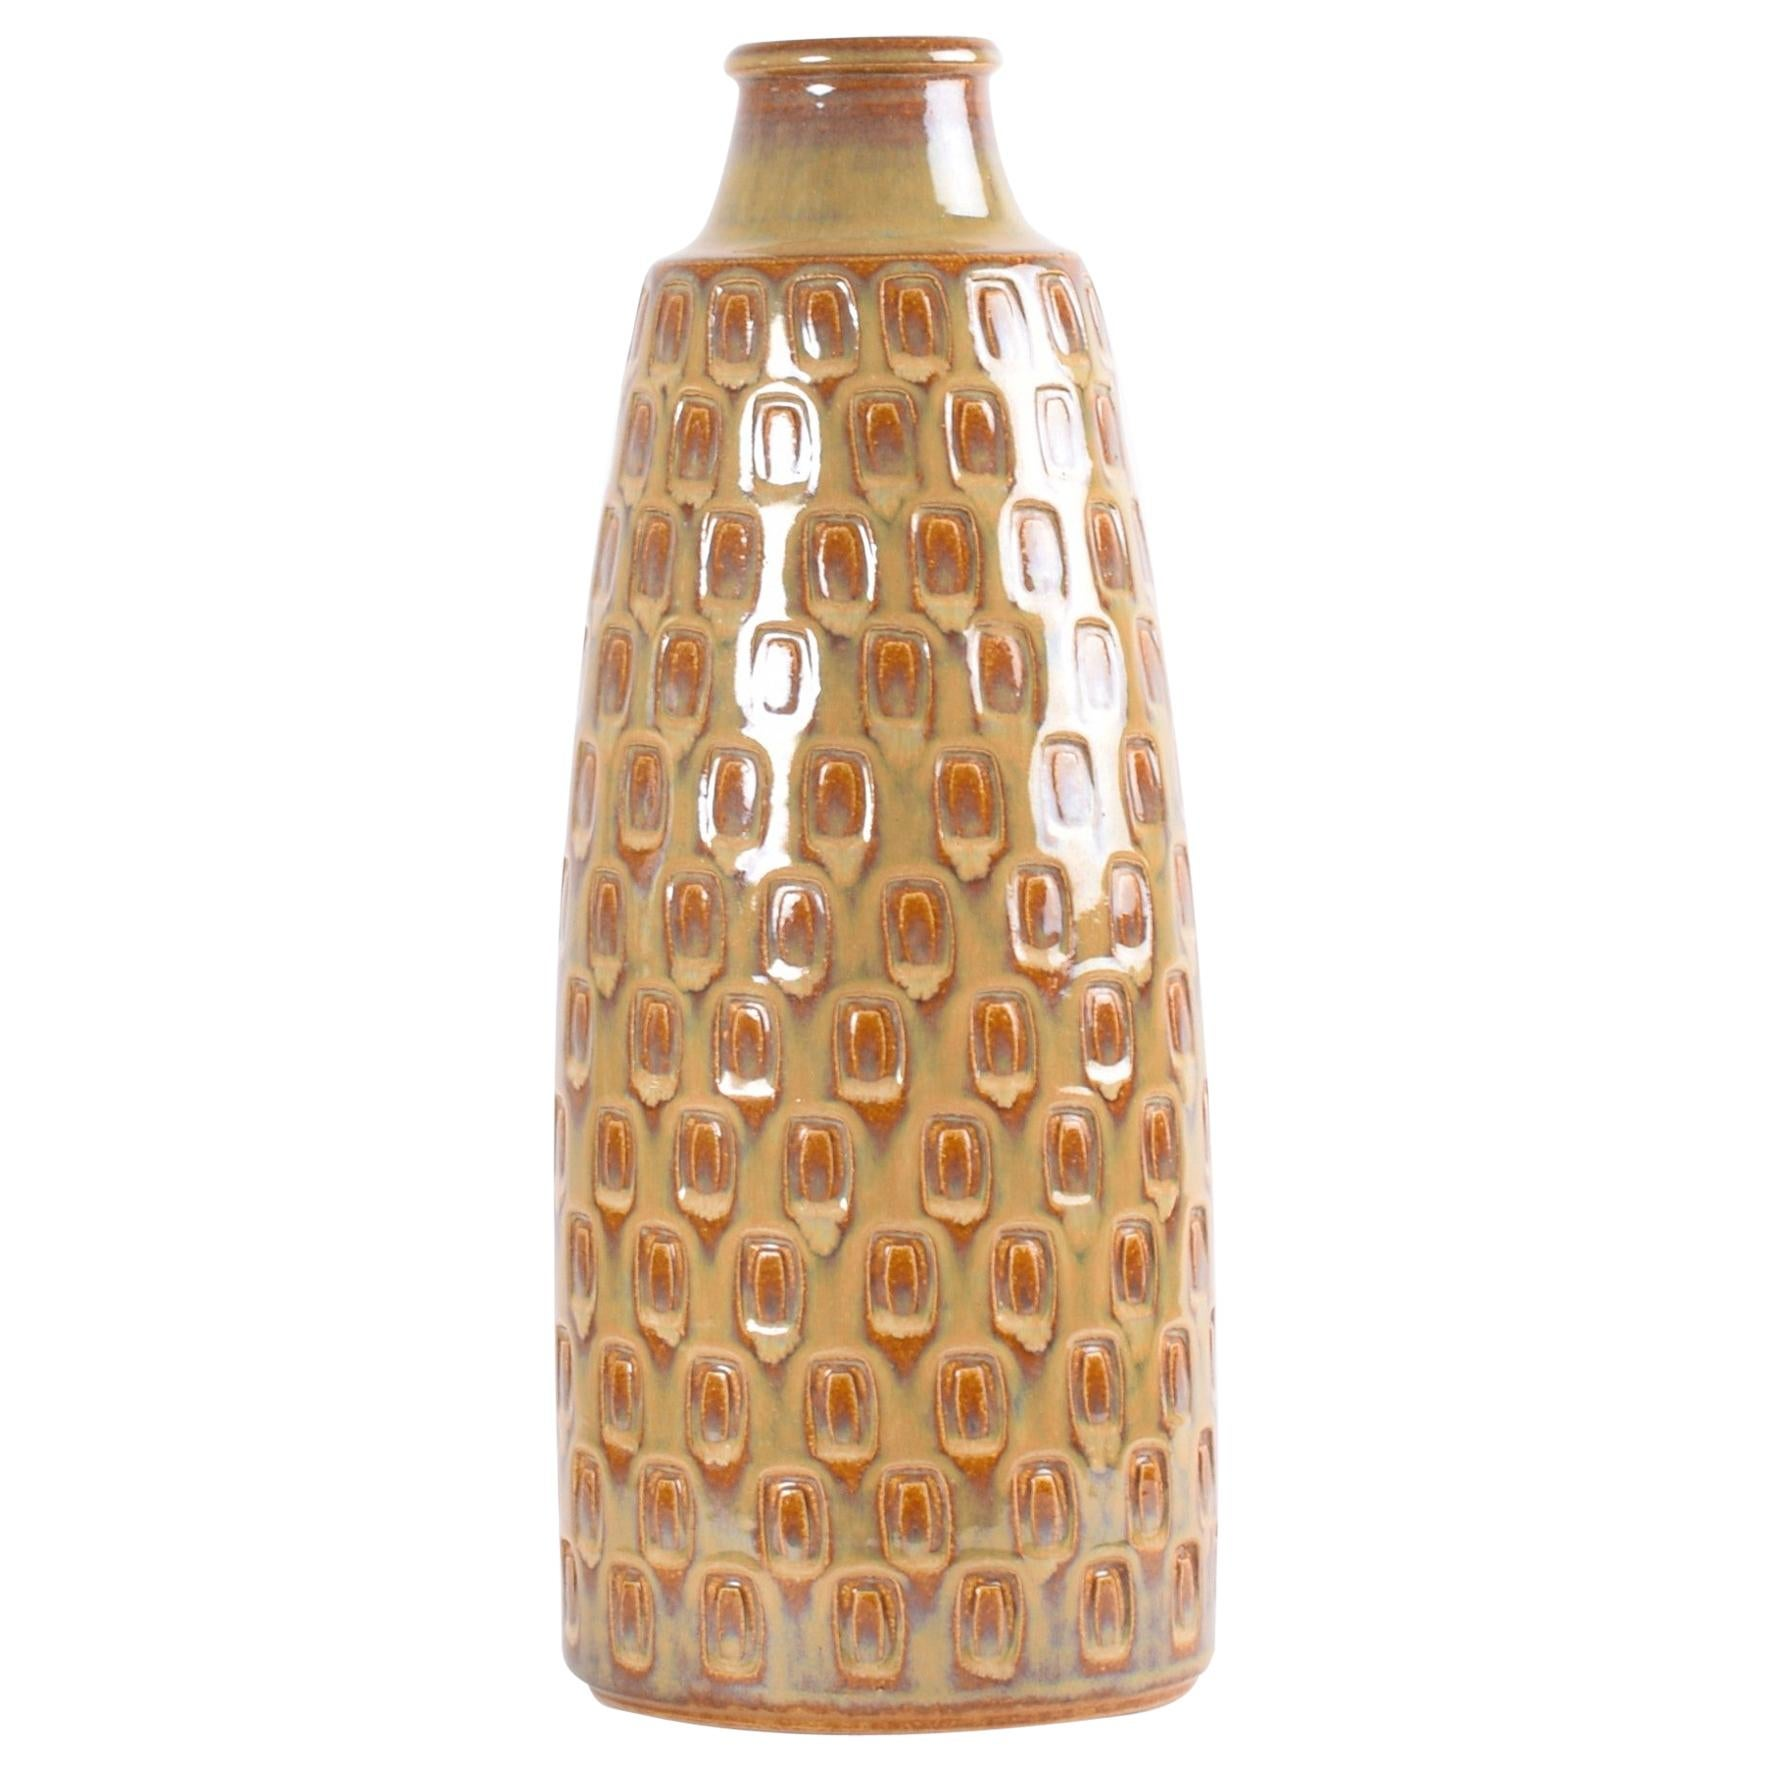 Danish Midcentury Søholm Floor Vase Ceramic with Ochre Brown Purple Glaze, 1960s